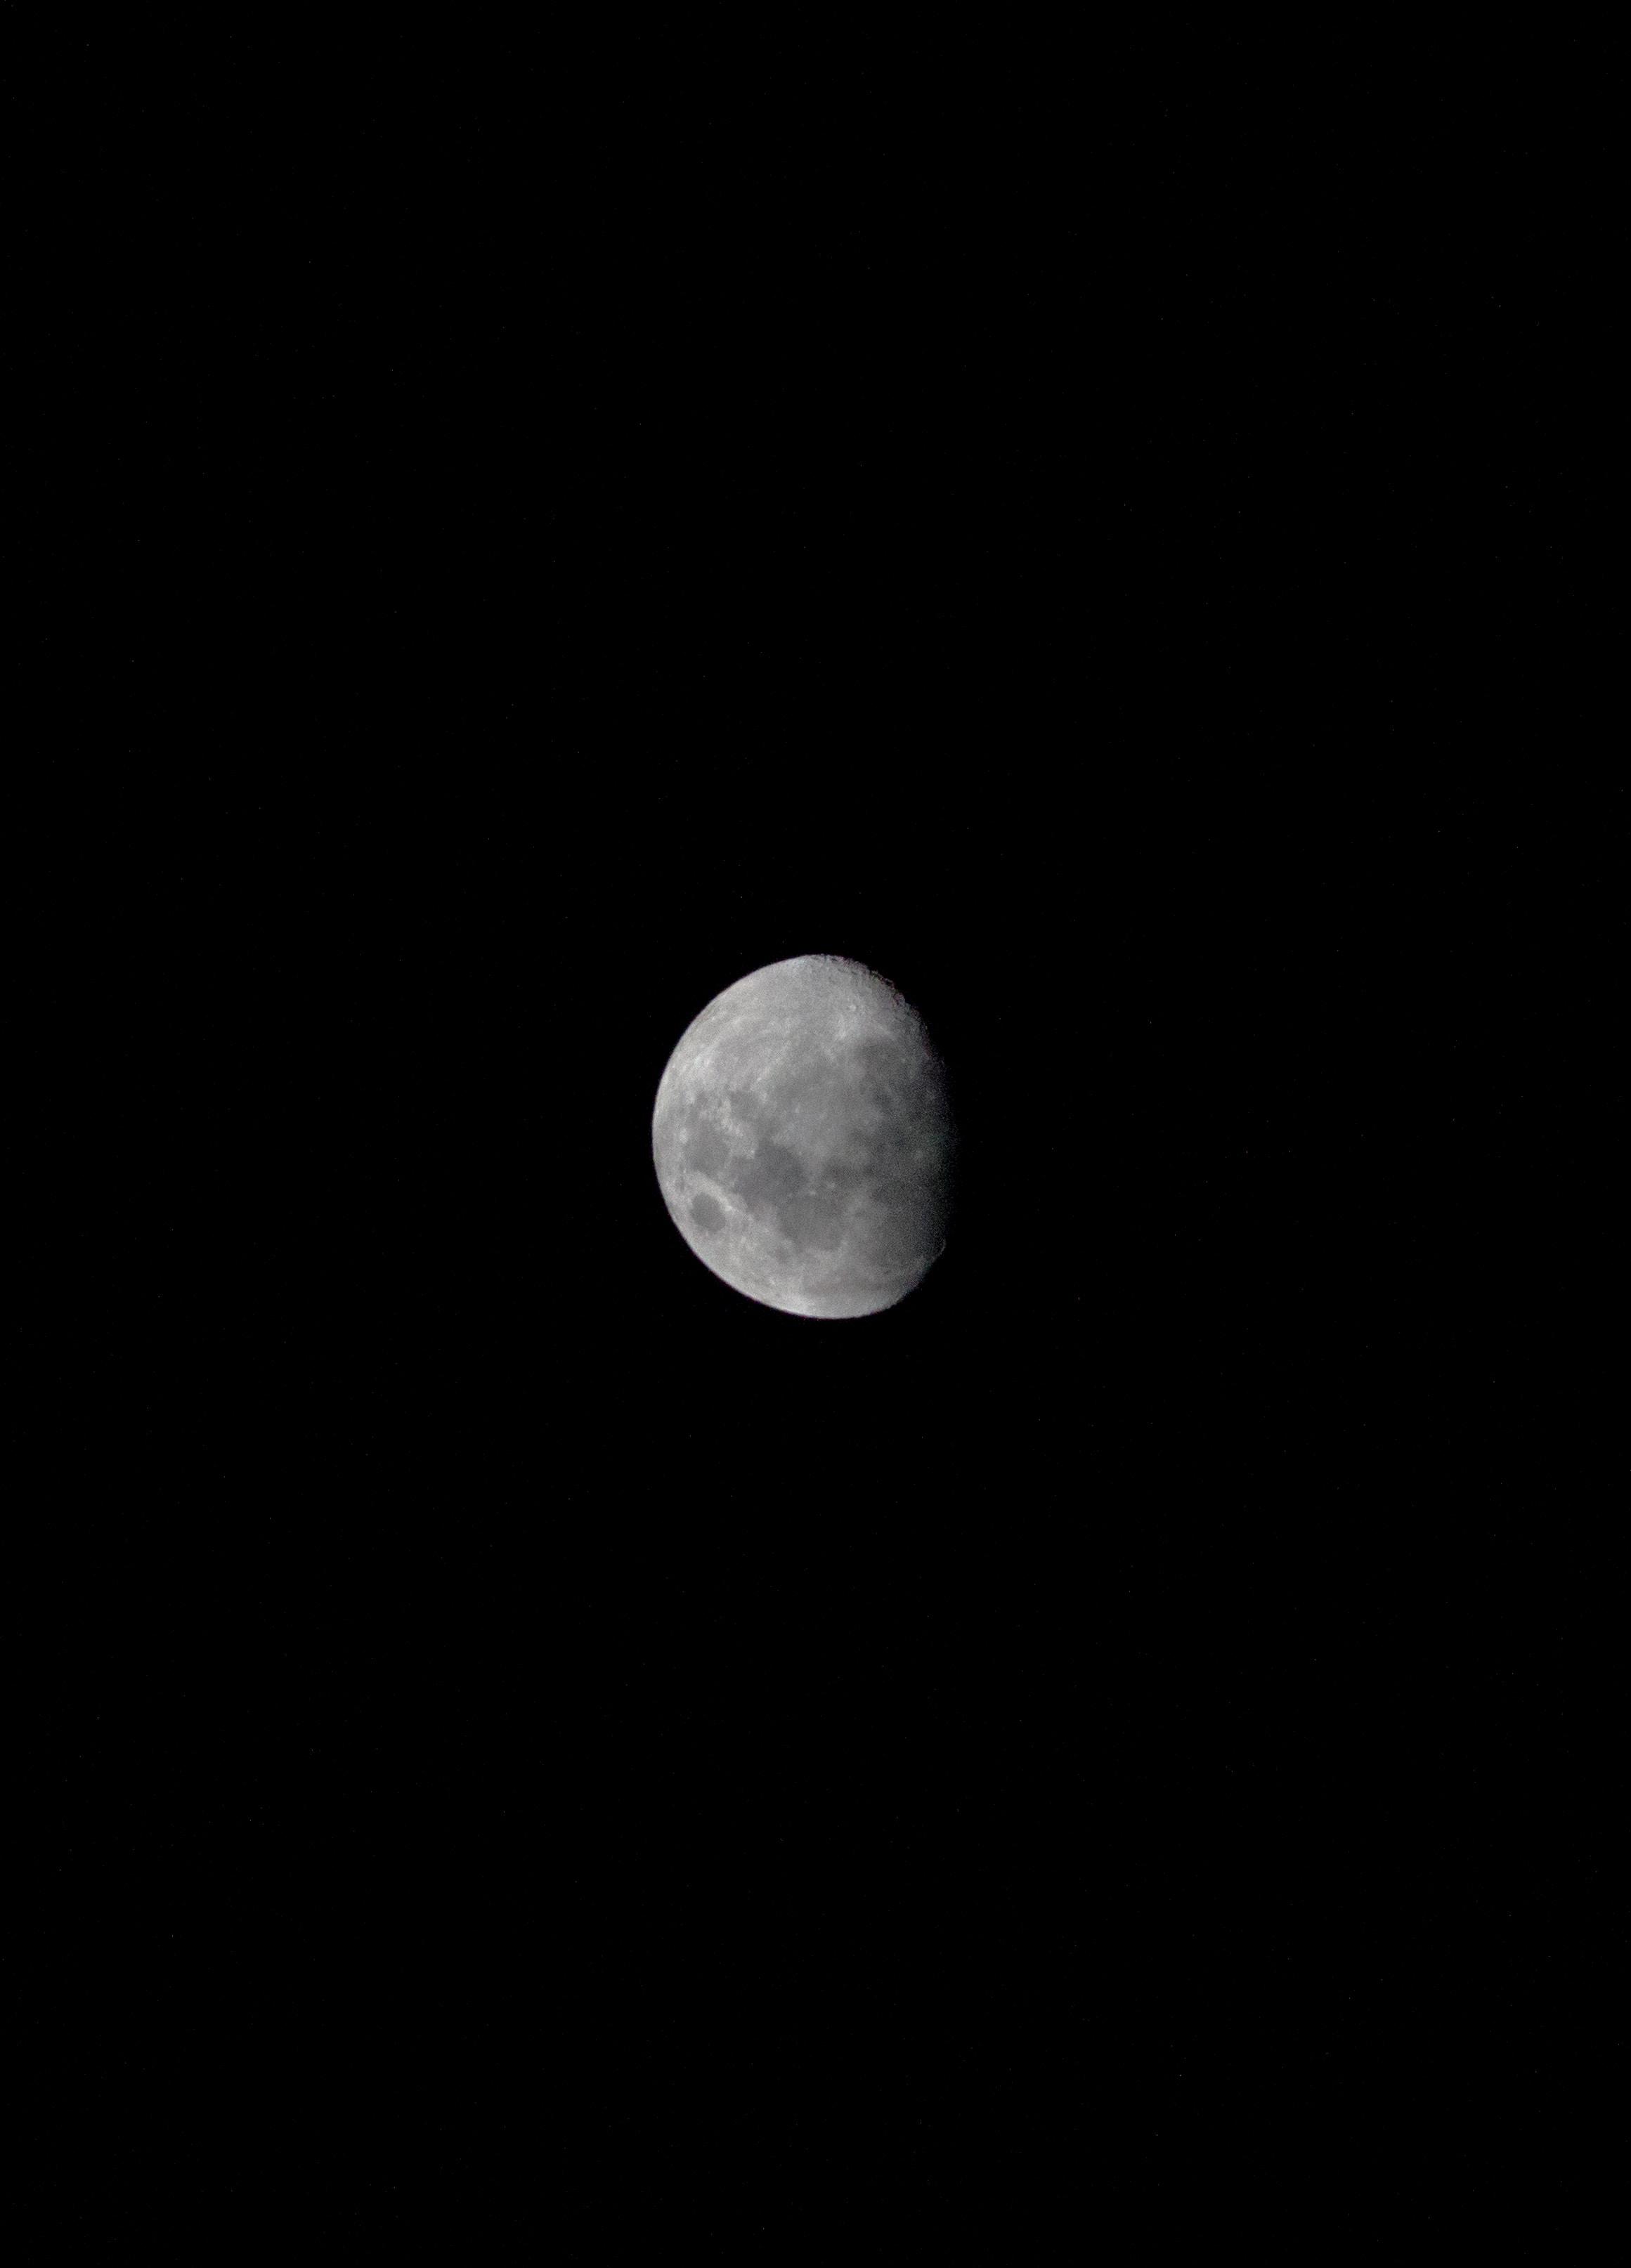 waxing moon in night sky